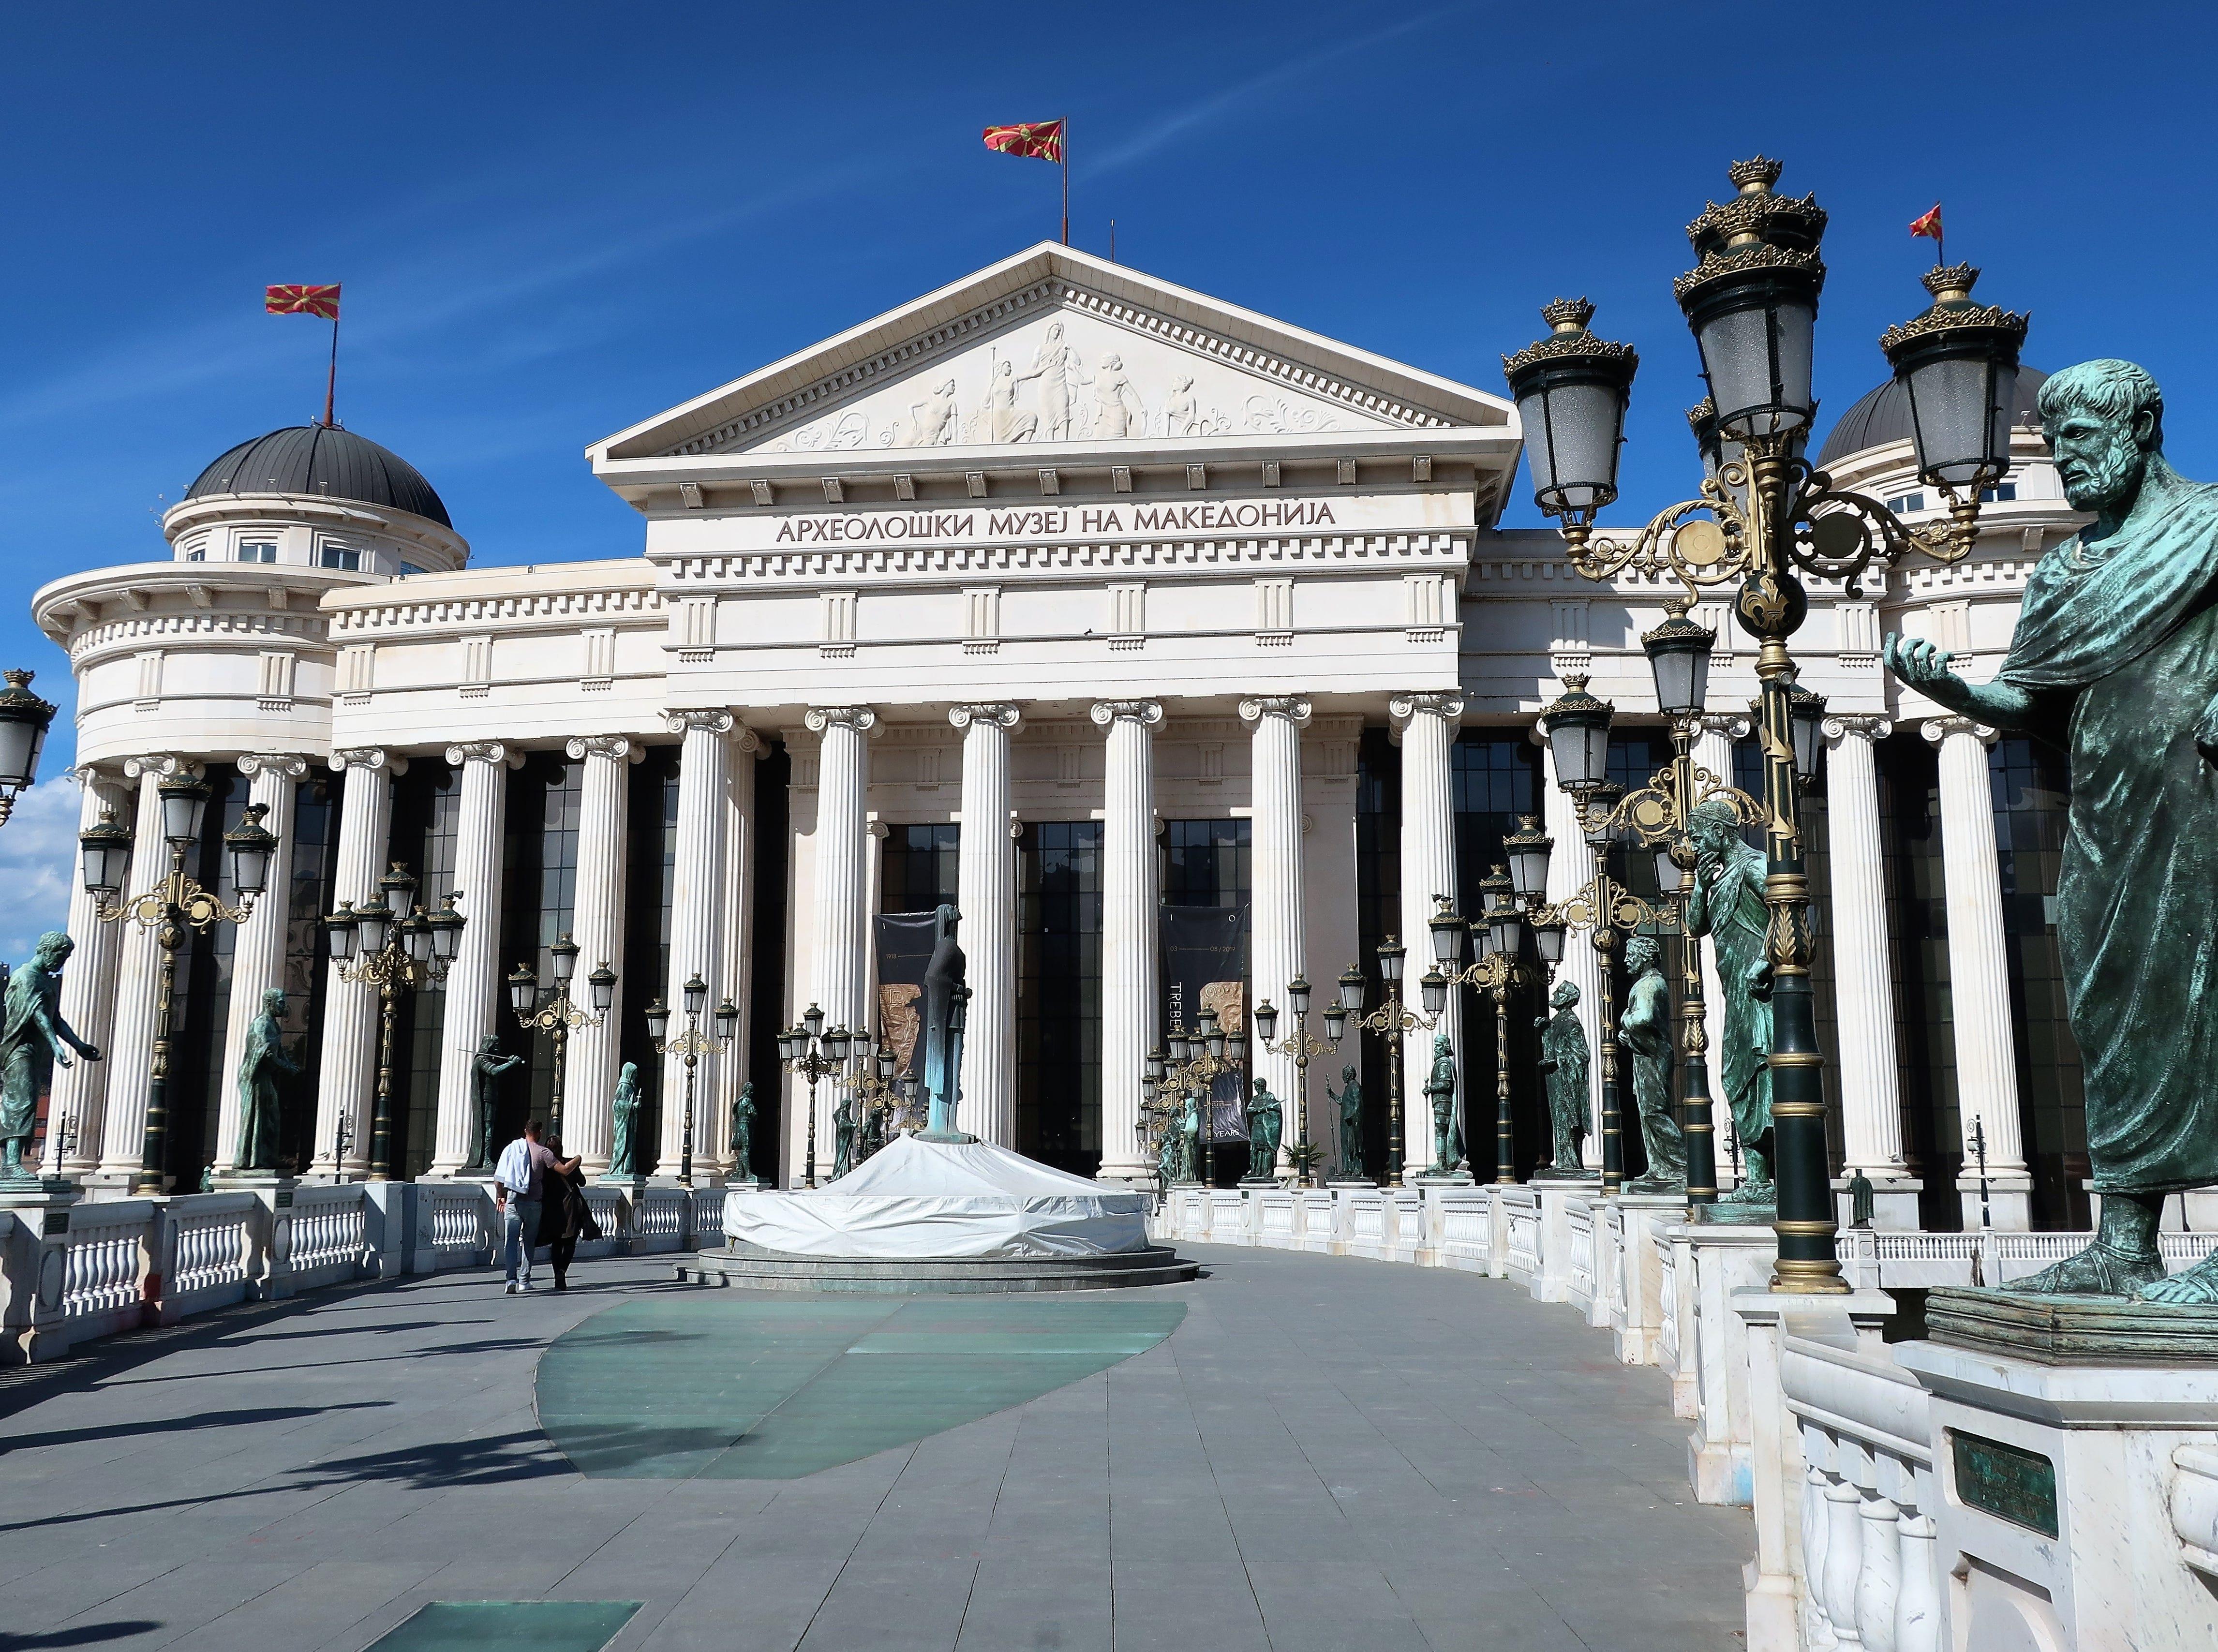 Some 31 statues line the Bridge of Civilizations in downtown Skopje, North Macedonia.